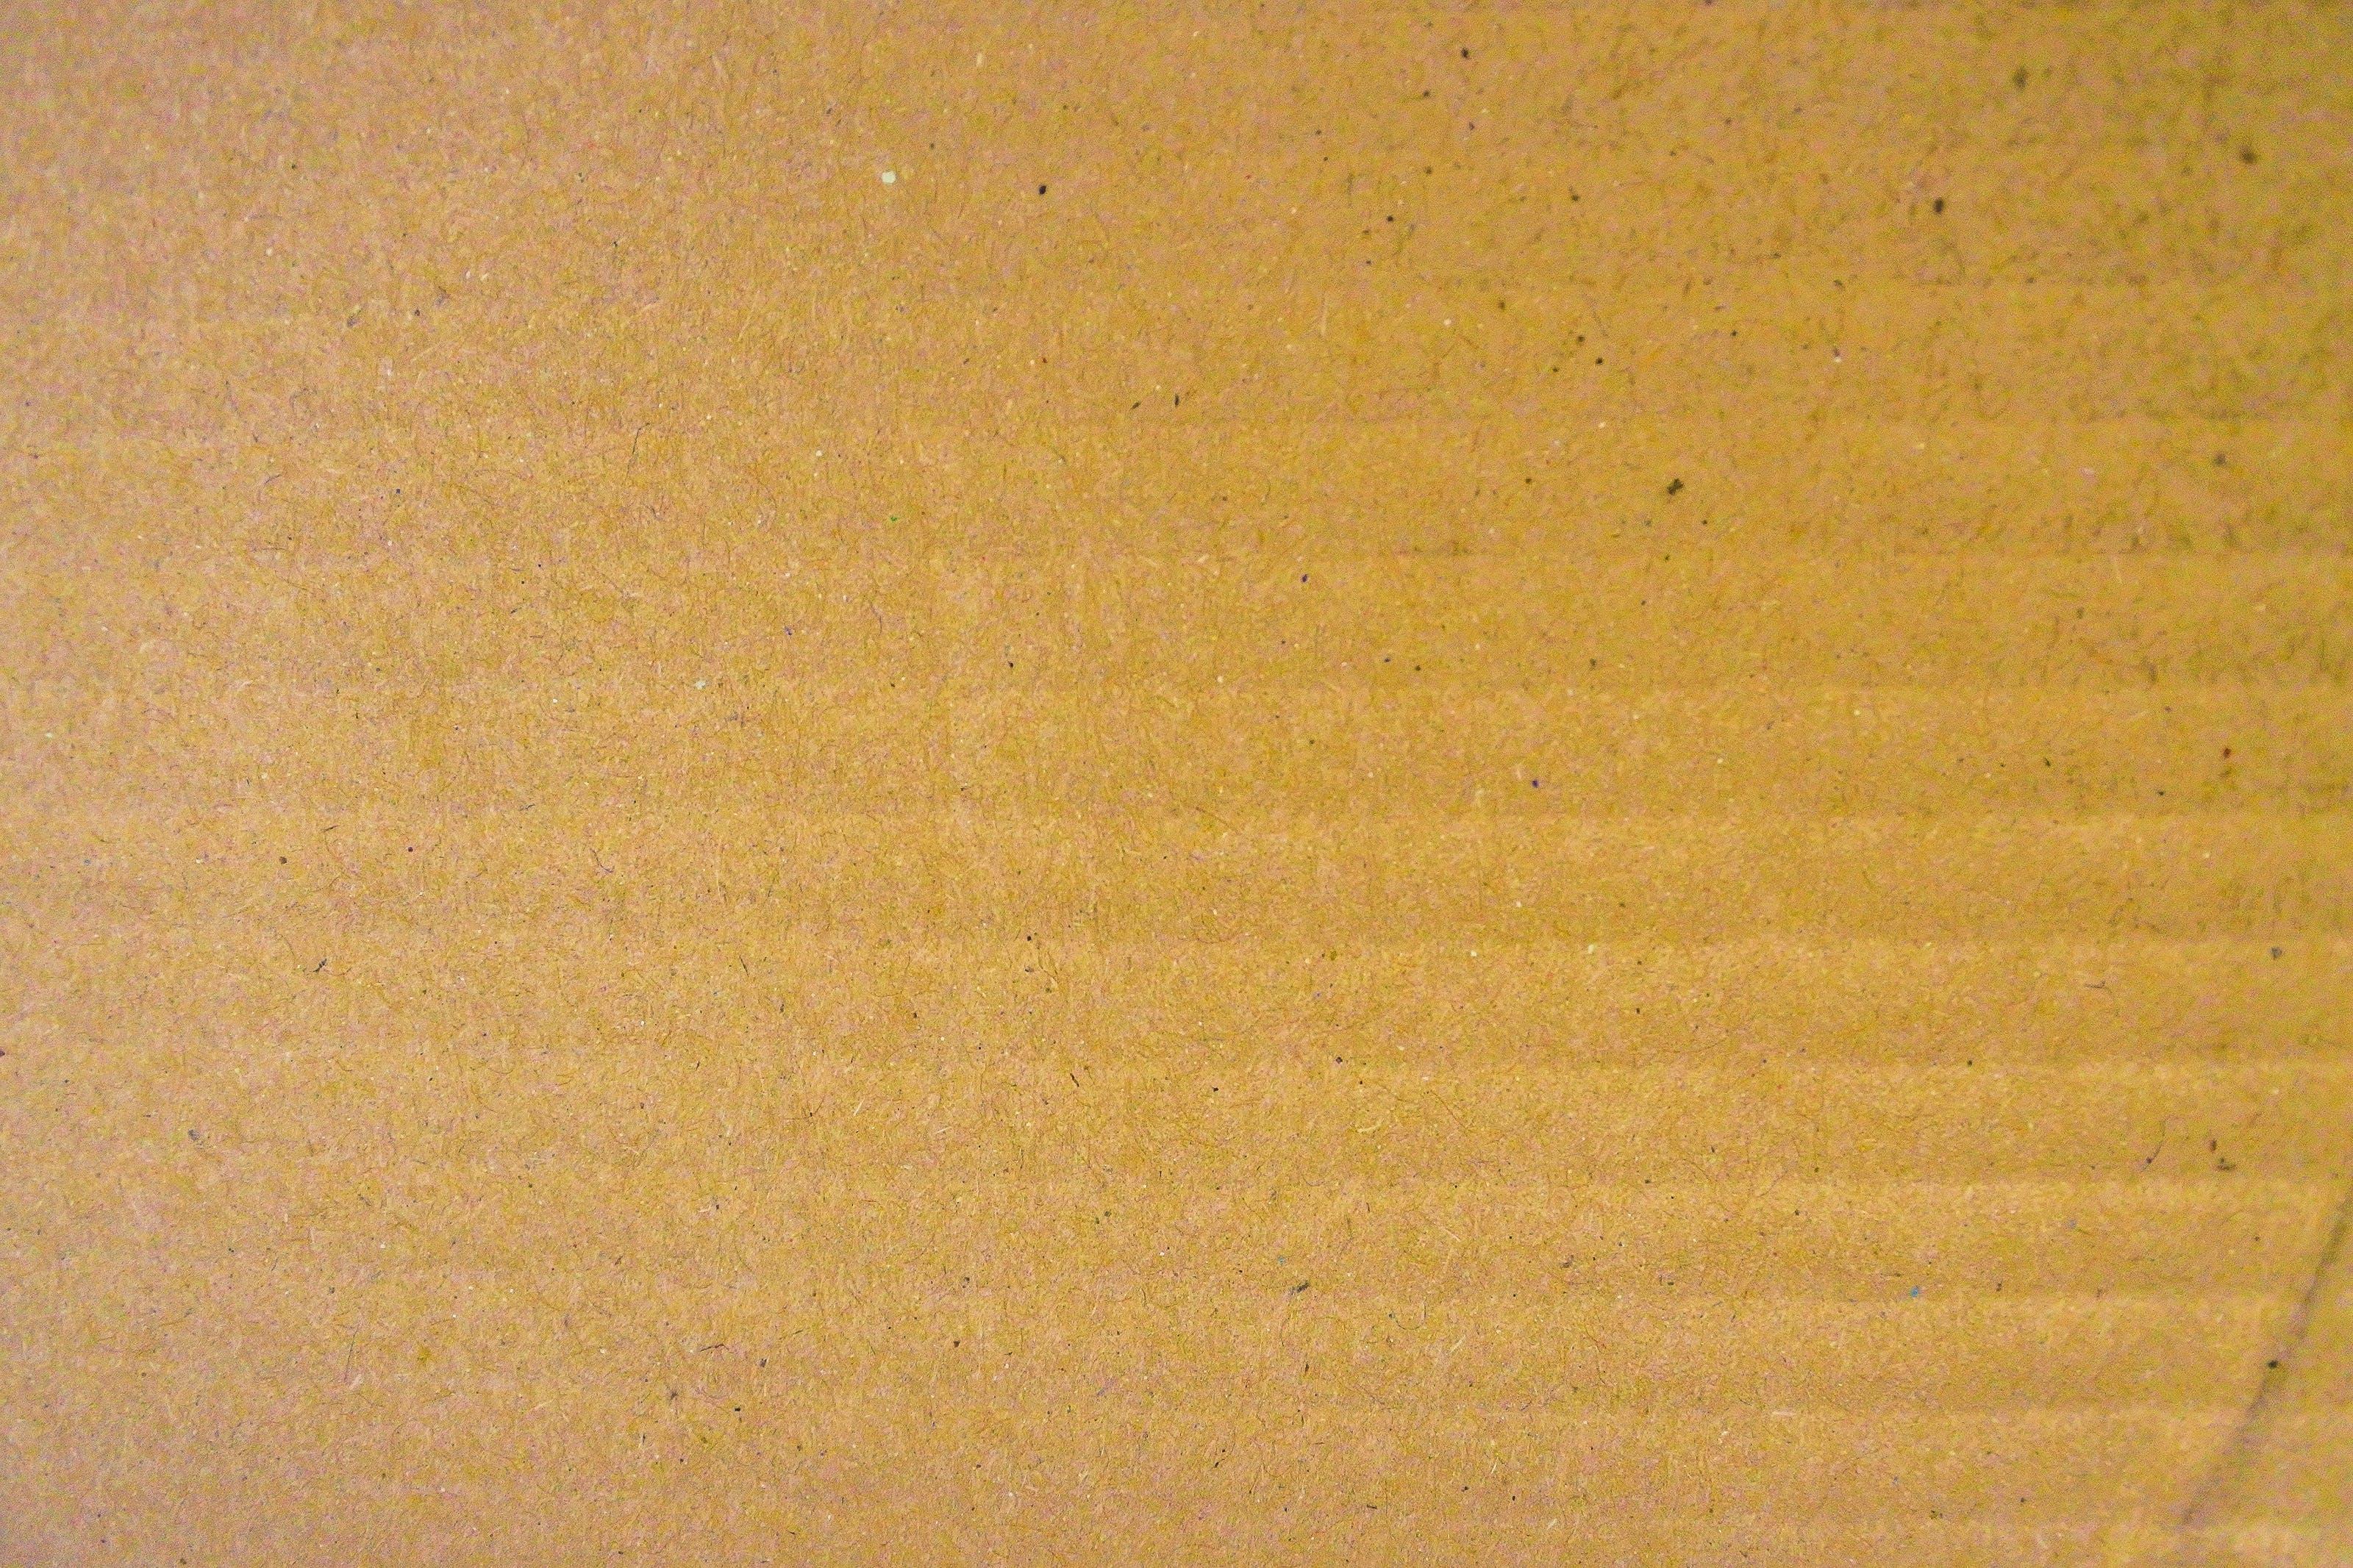 Free stock photo of art, background, beige, blank